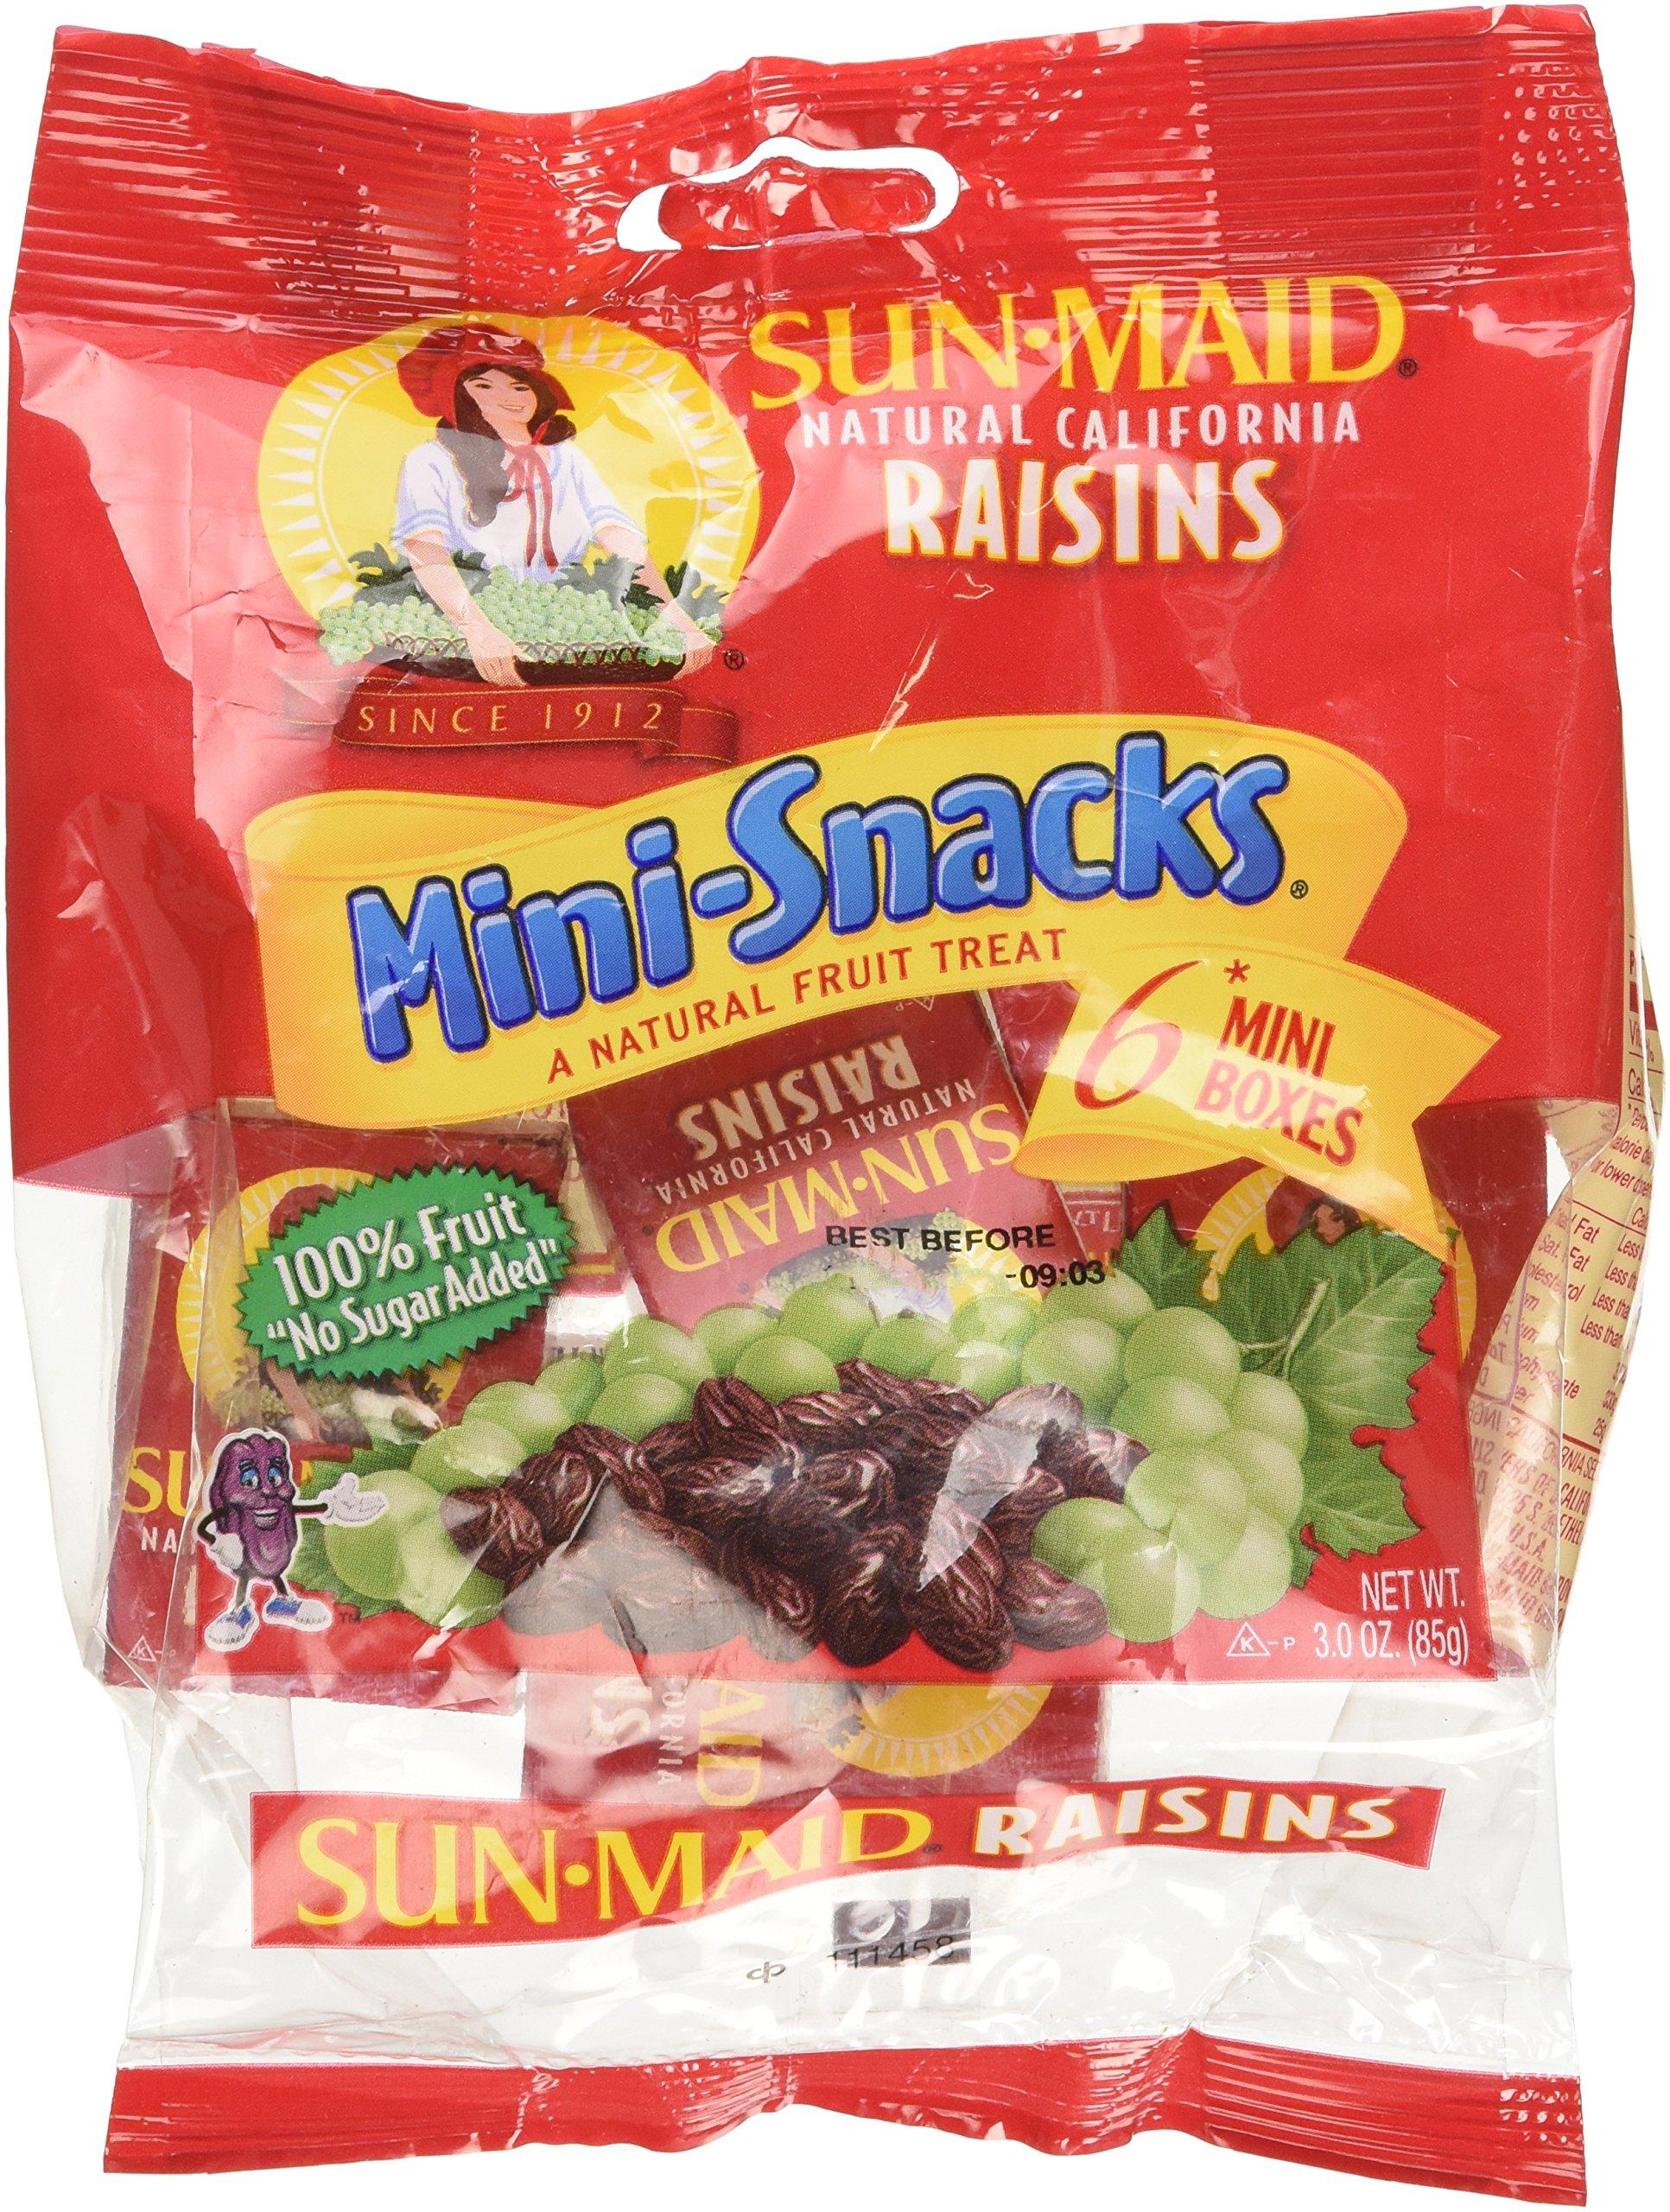 SUN Maid Natural California Raisins Mini-snacks a Natural Fruit Treat: 12 Packs of 6 Mini Boxes (Total of 72 Boxes) - Dt